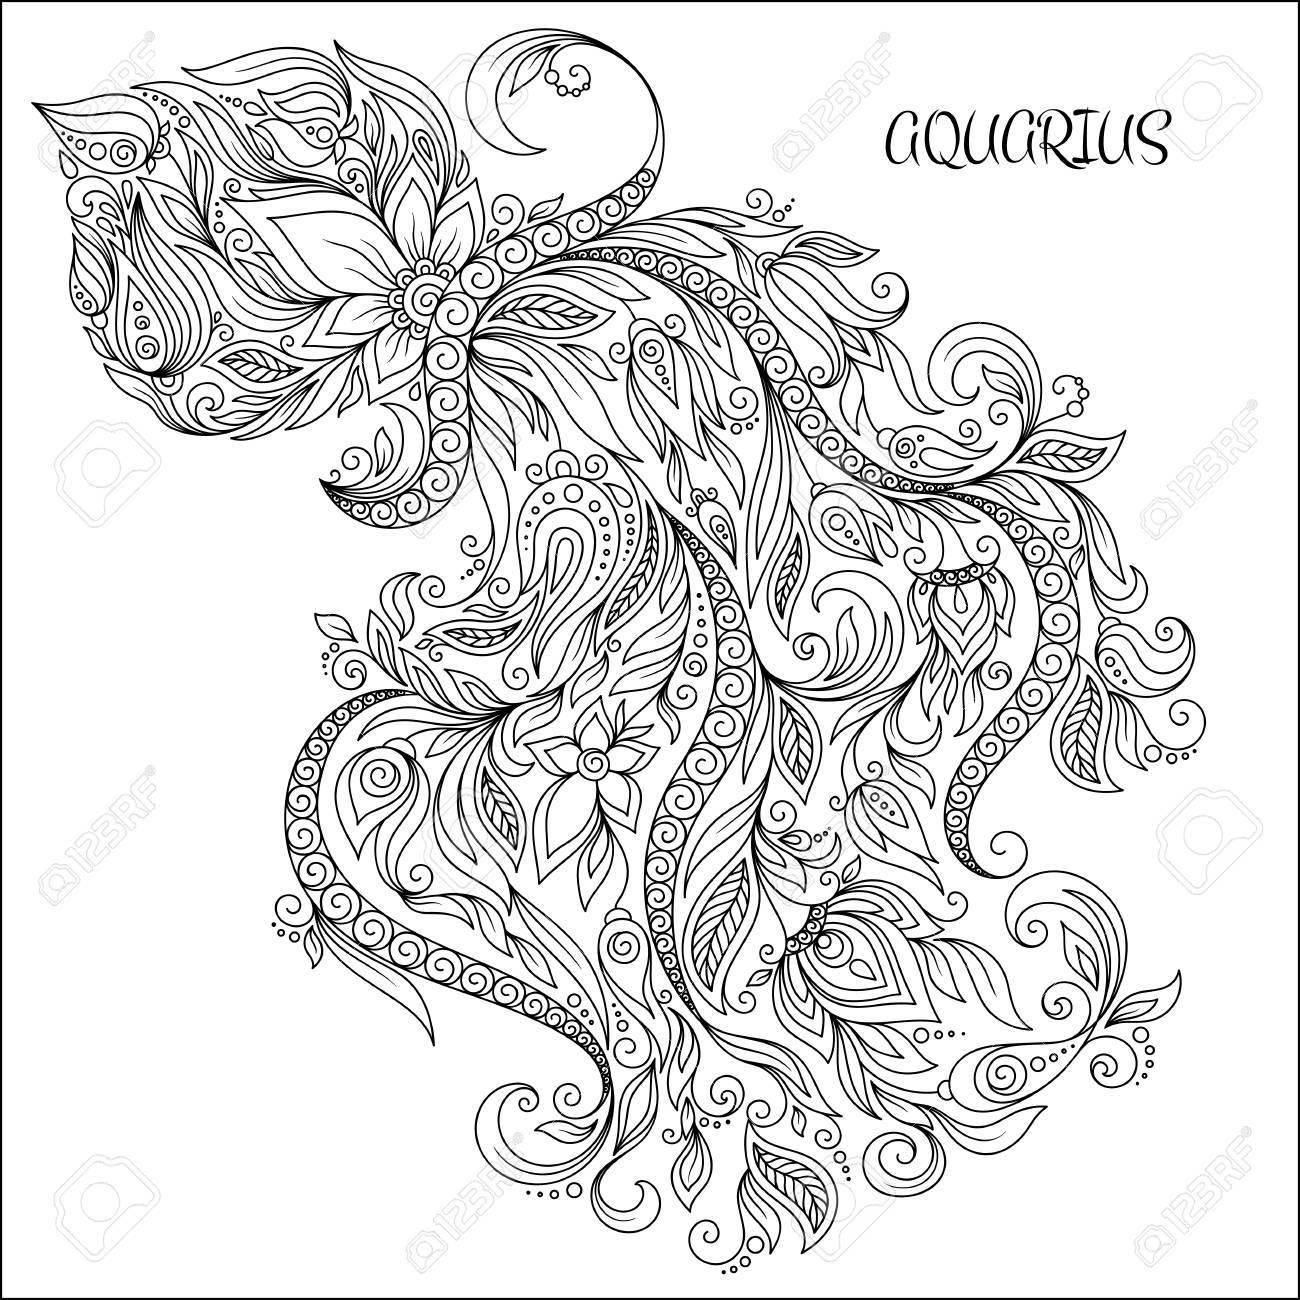 Pattern for coloring book hand drawn line flowers art of zodiac hand drawn line flowers art of zodiac aquarius horoscope symbol buycottarizona